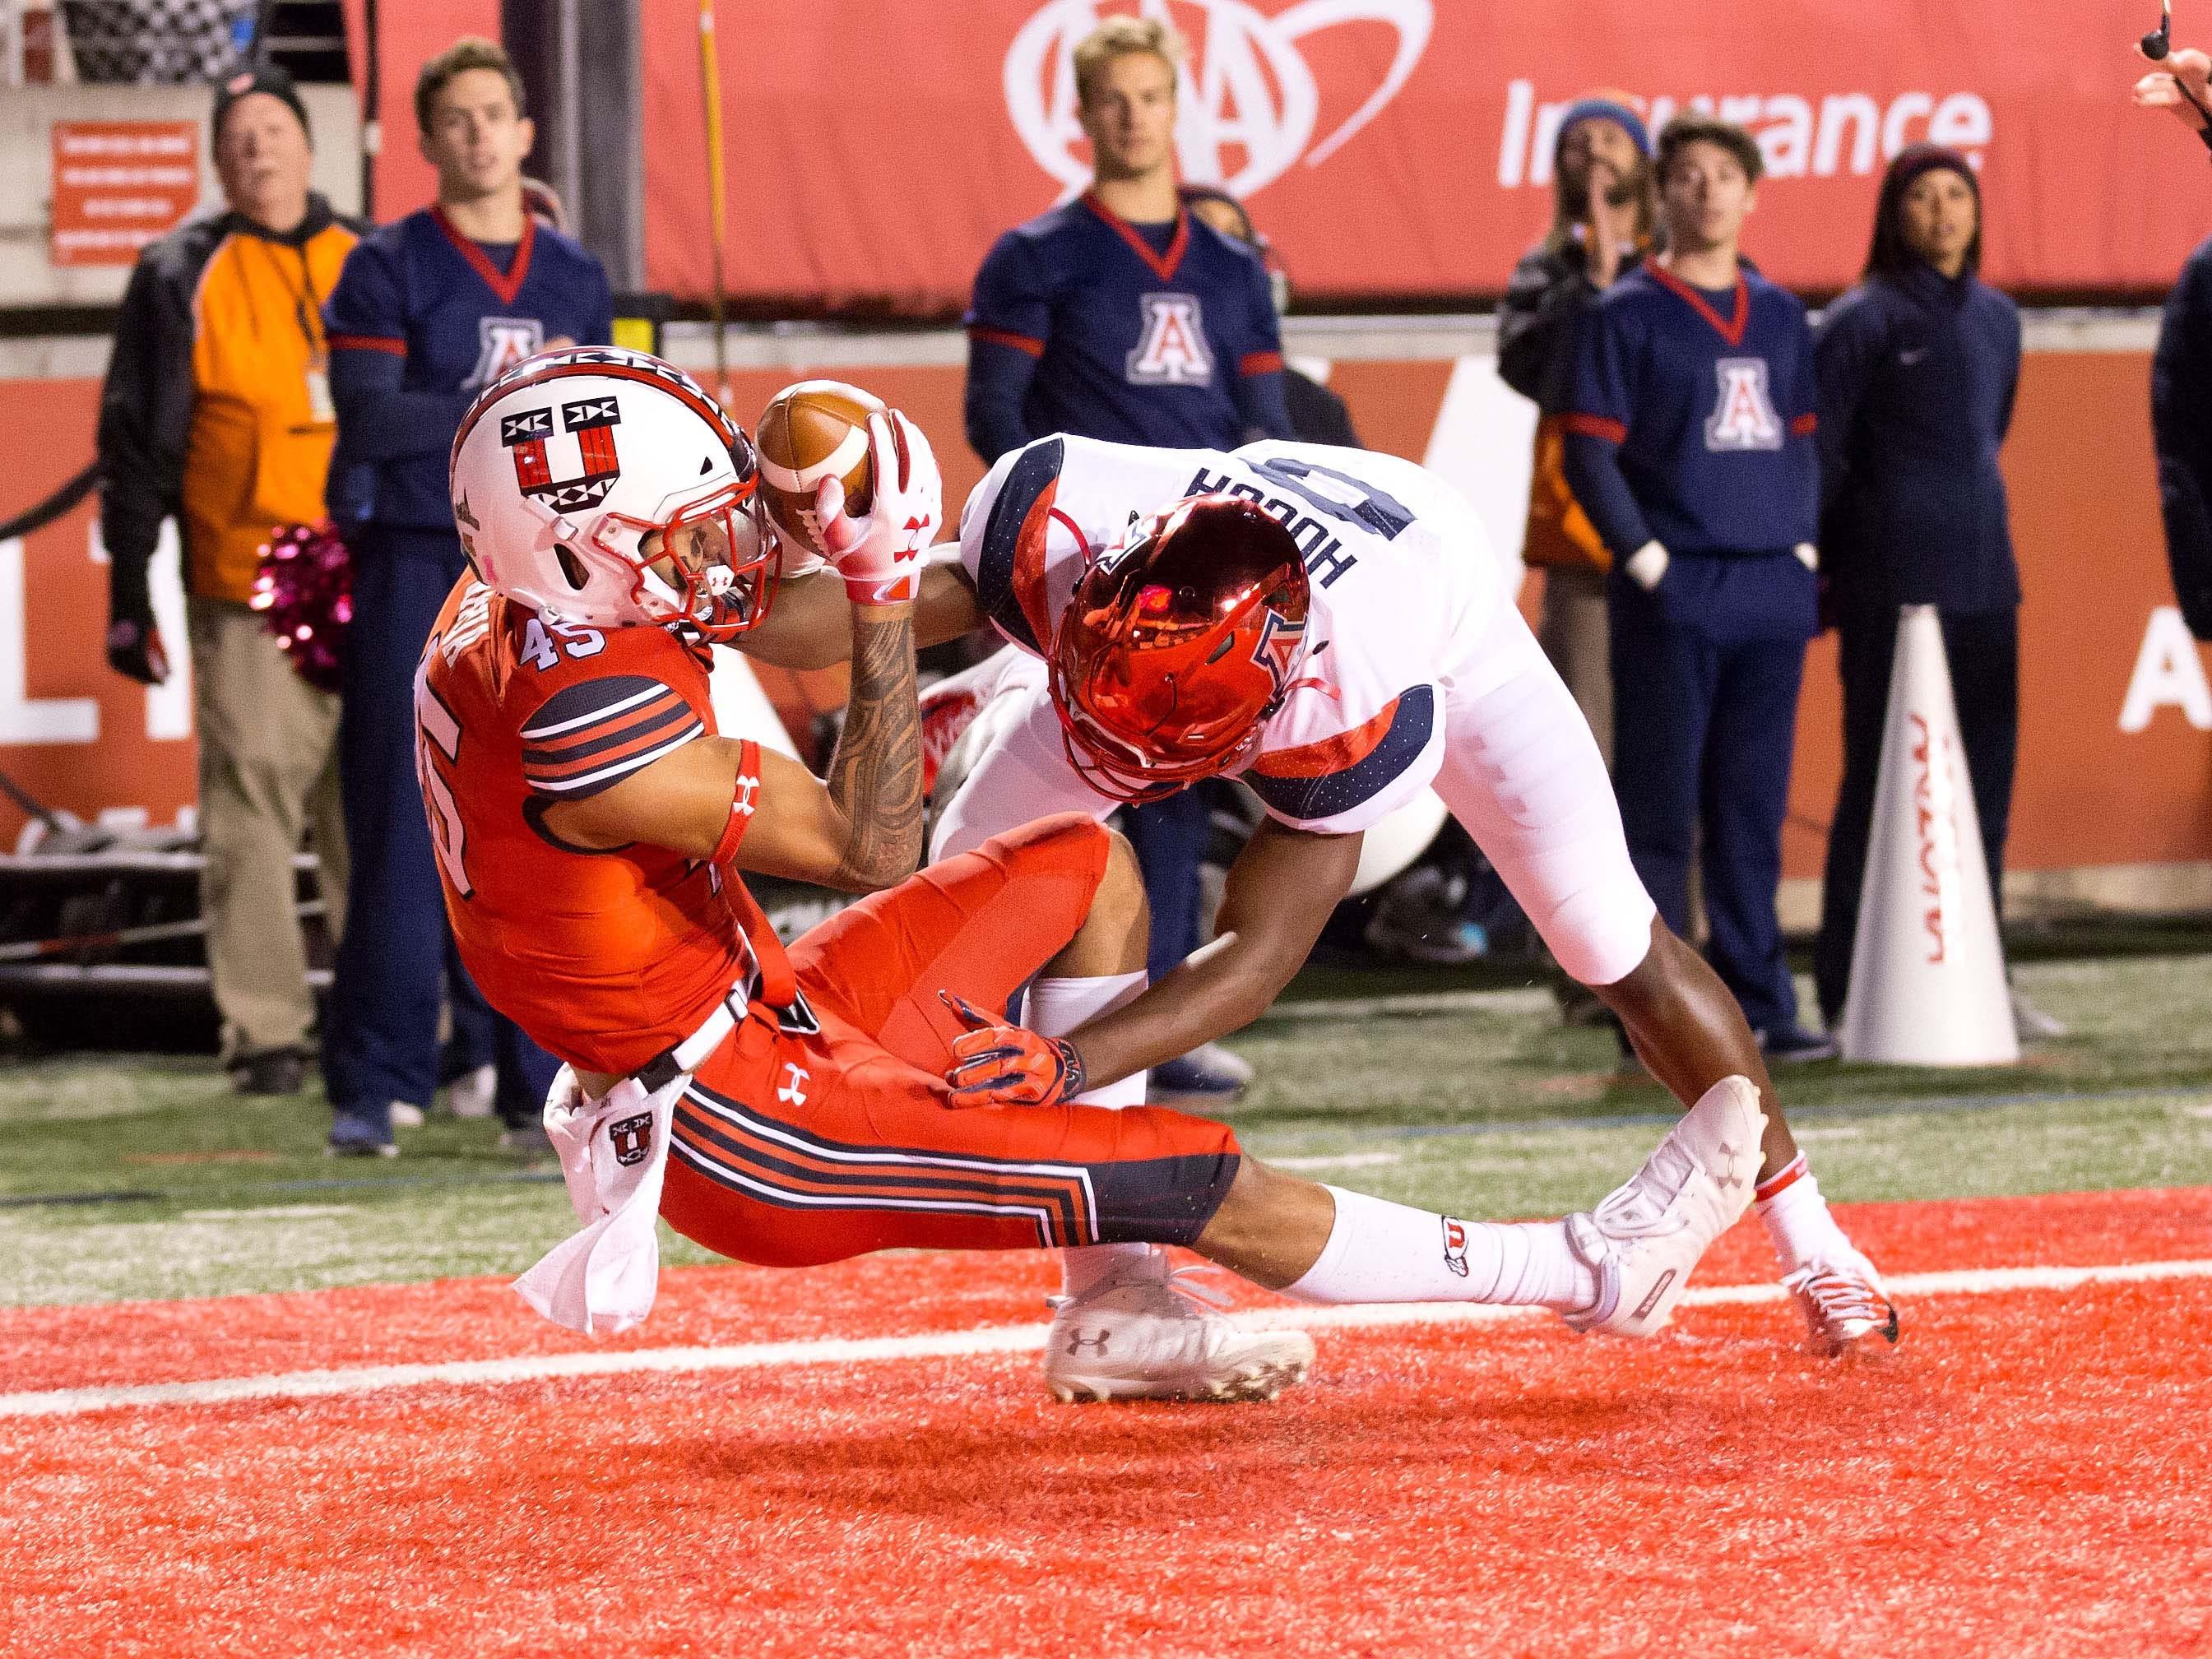 Oct 12, 2018; Salt Lake City, UT, USA; Utah Utes wide receiver Samson Nacua (45) catches a touchdown pass against Arizona Wildcats cornerback Tim Hough (8) during the first quarter at Rice-Eccles Stadium.